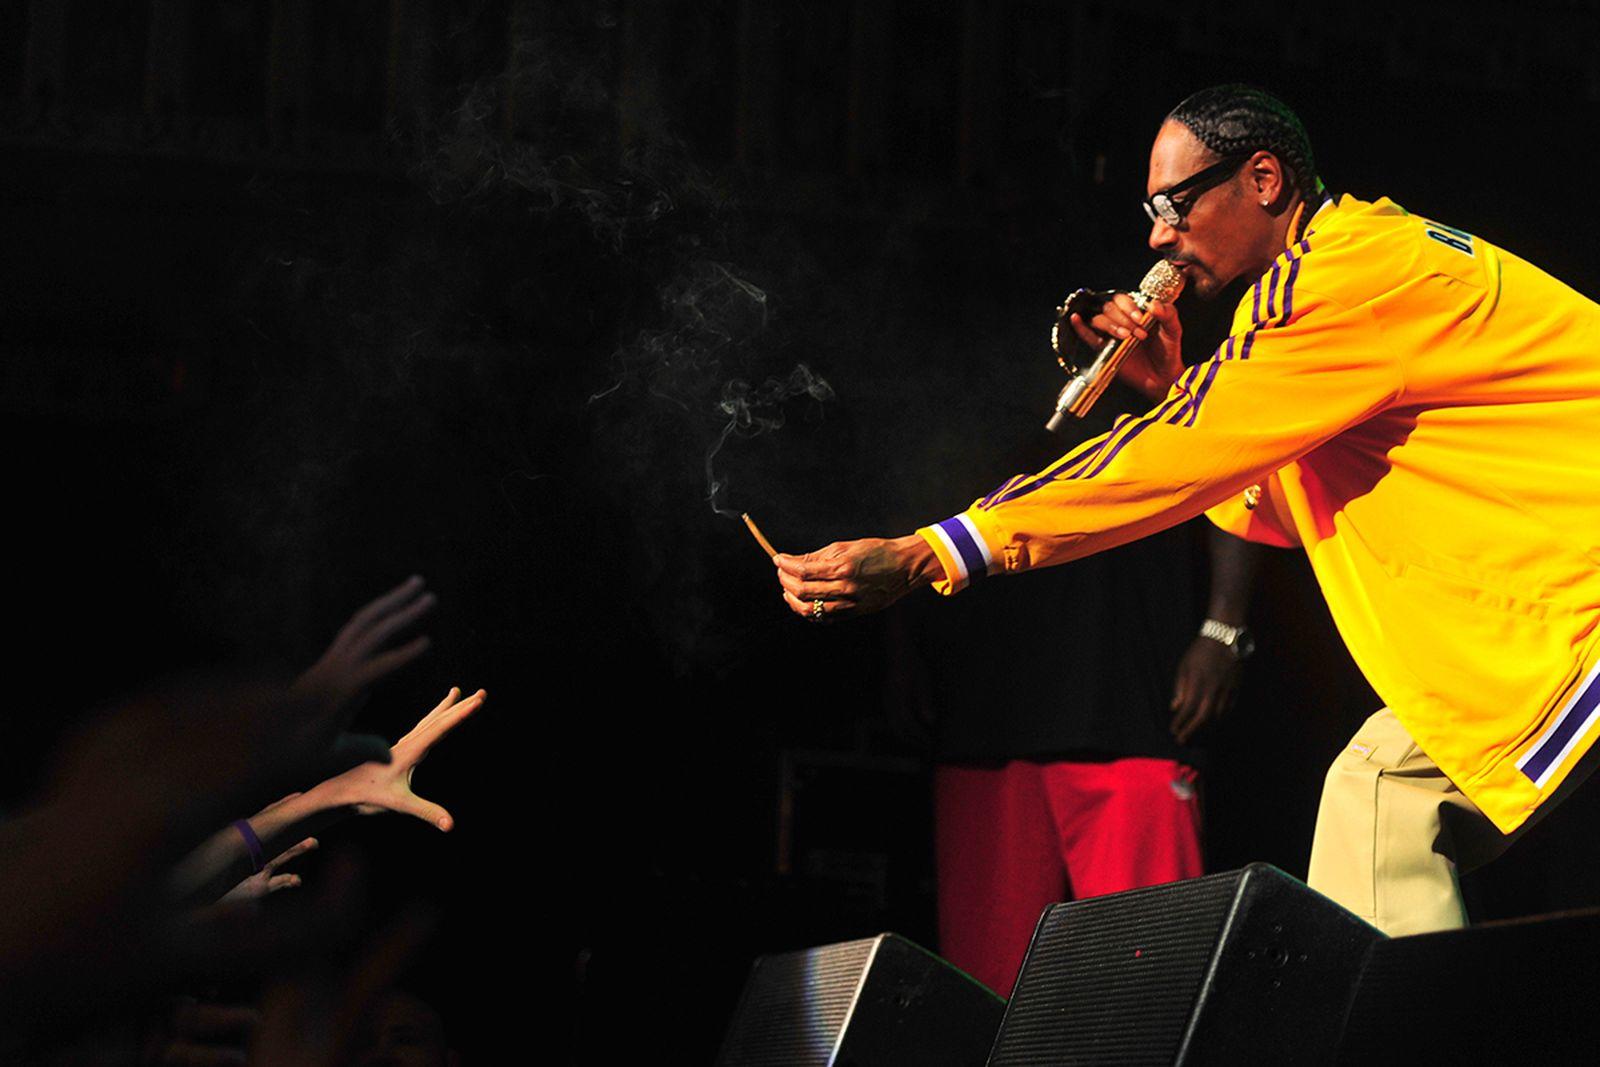 how marijuana hip hop became inseparable main 420 N.W.A. beastie boys